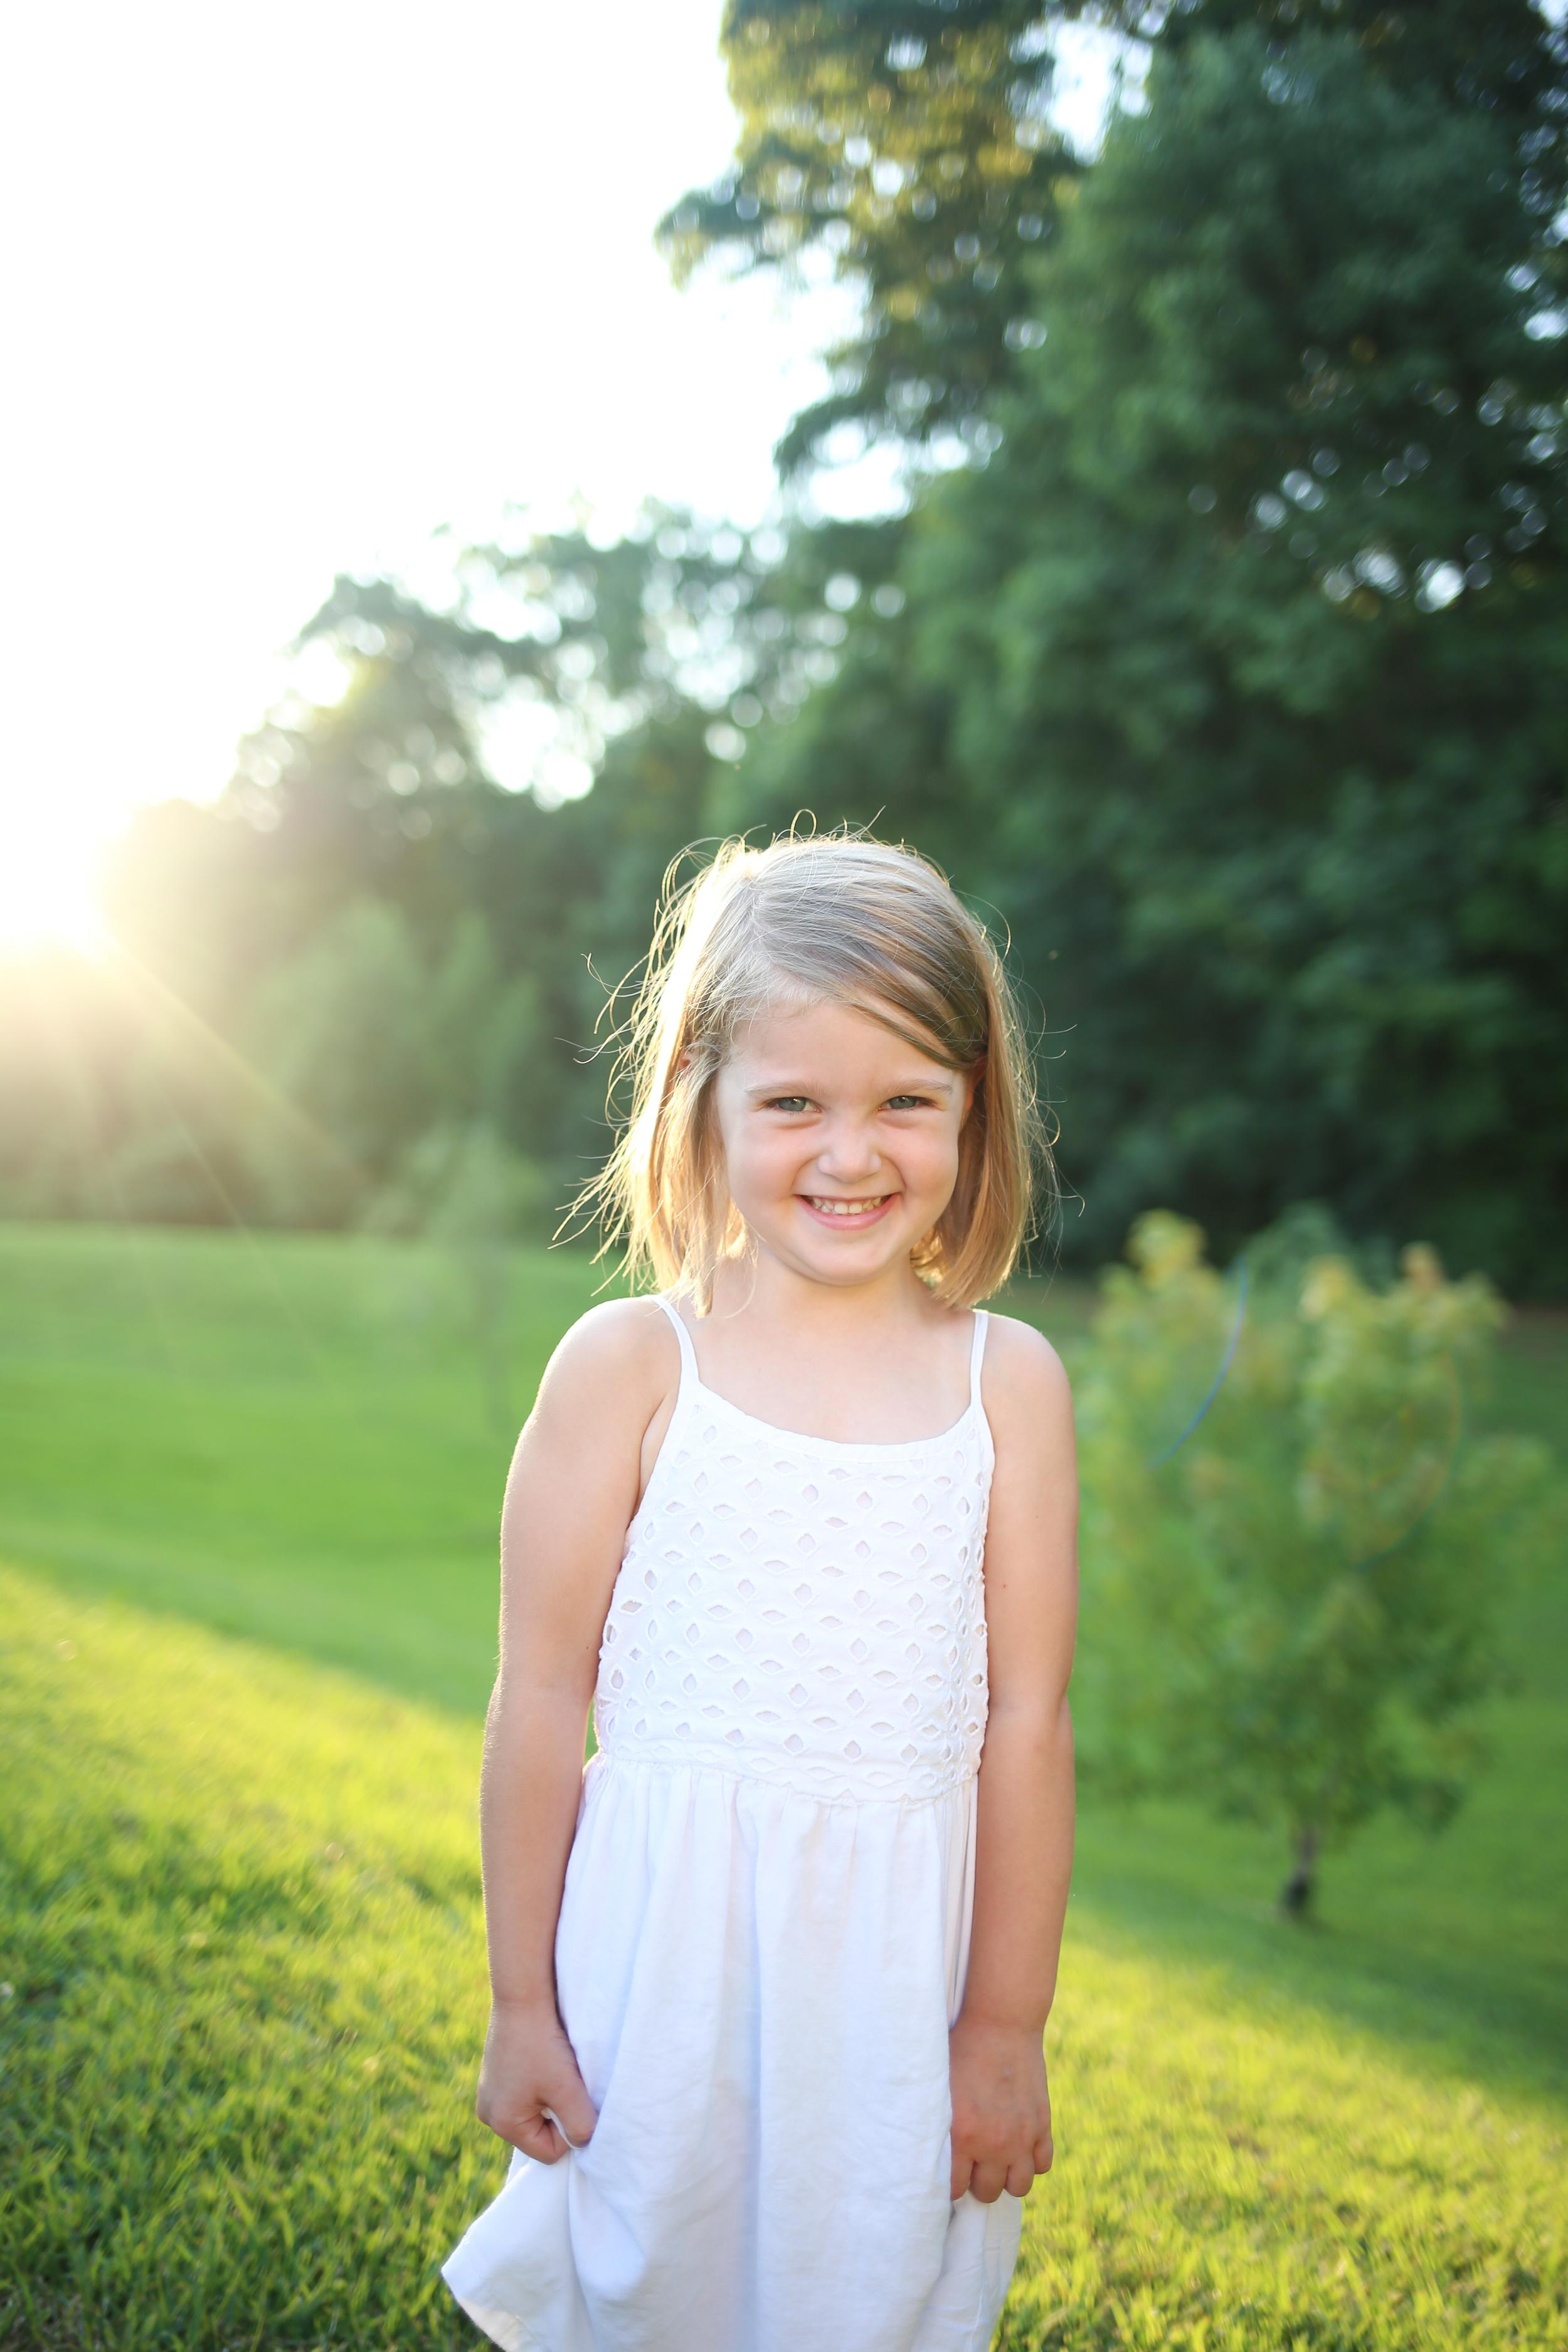 Clarksville Photographer - Whit Meza Photography